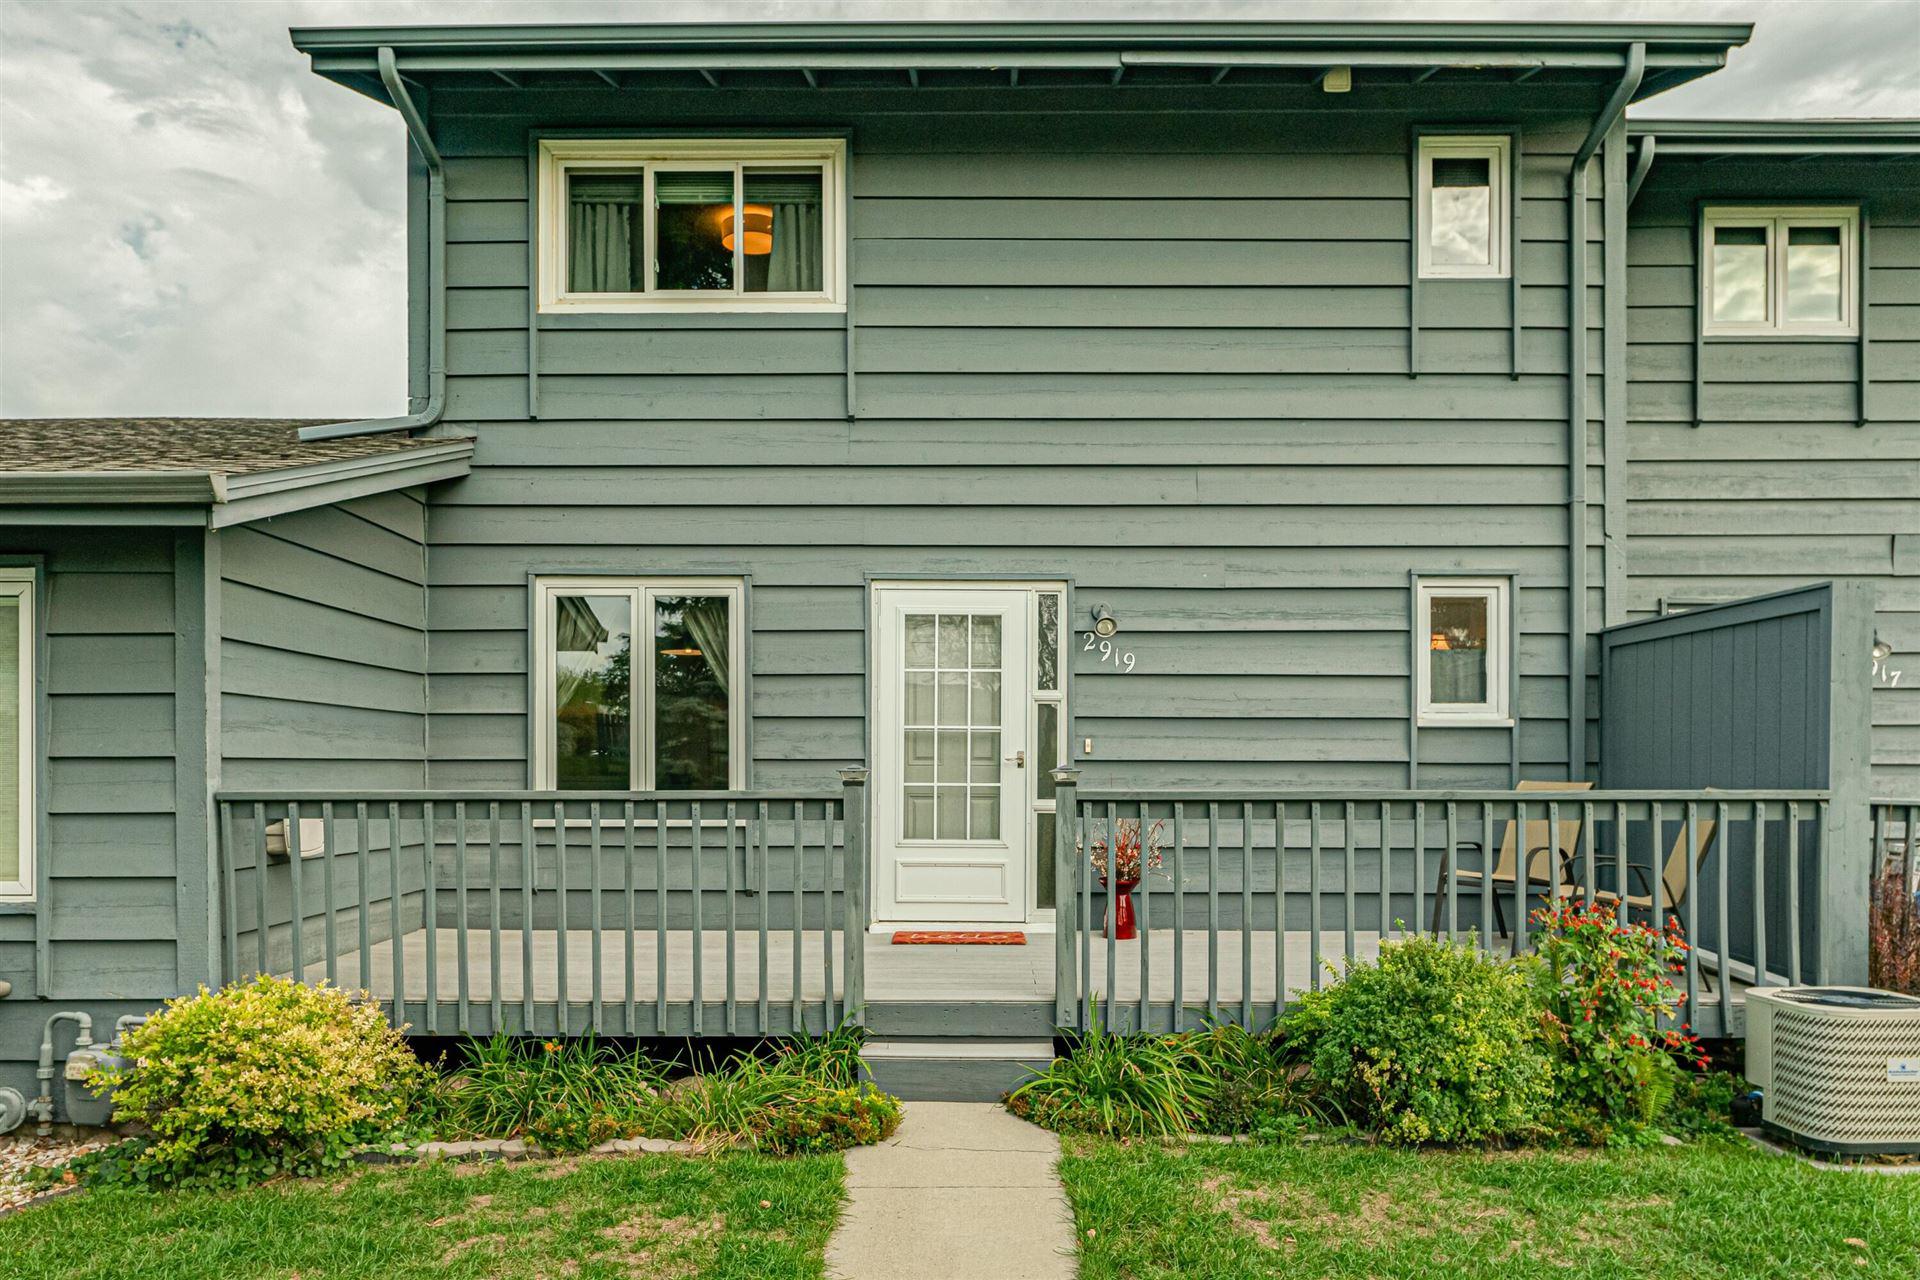 2919 Winnipeg Drive, Bismarck, ND 58503 - #: 412377